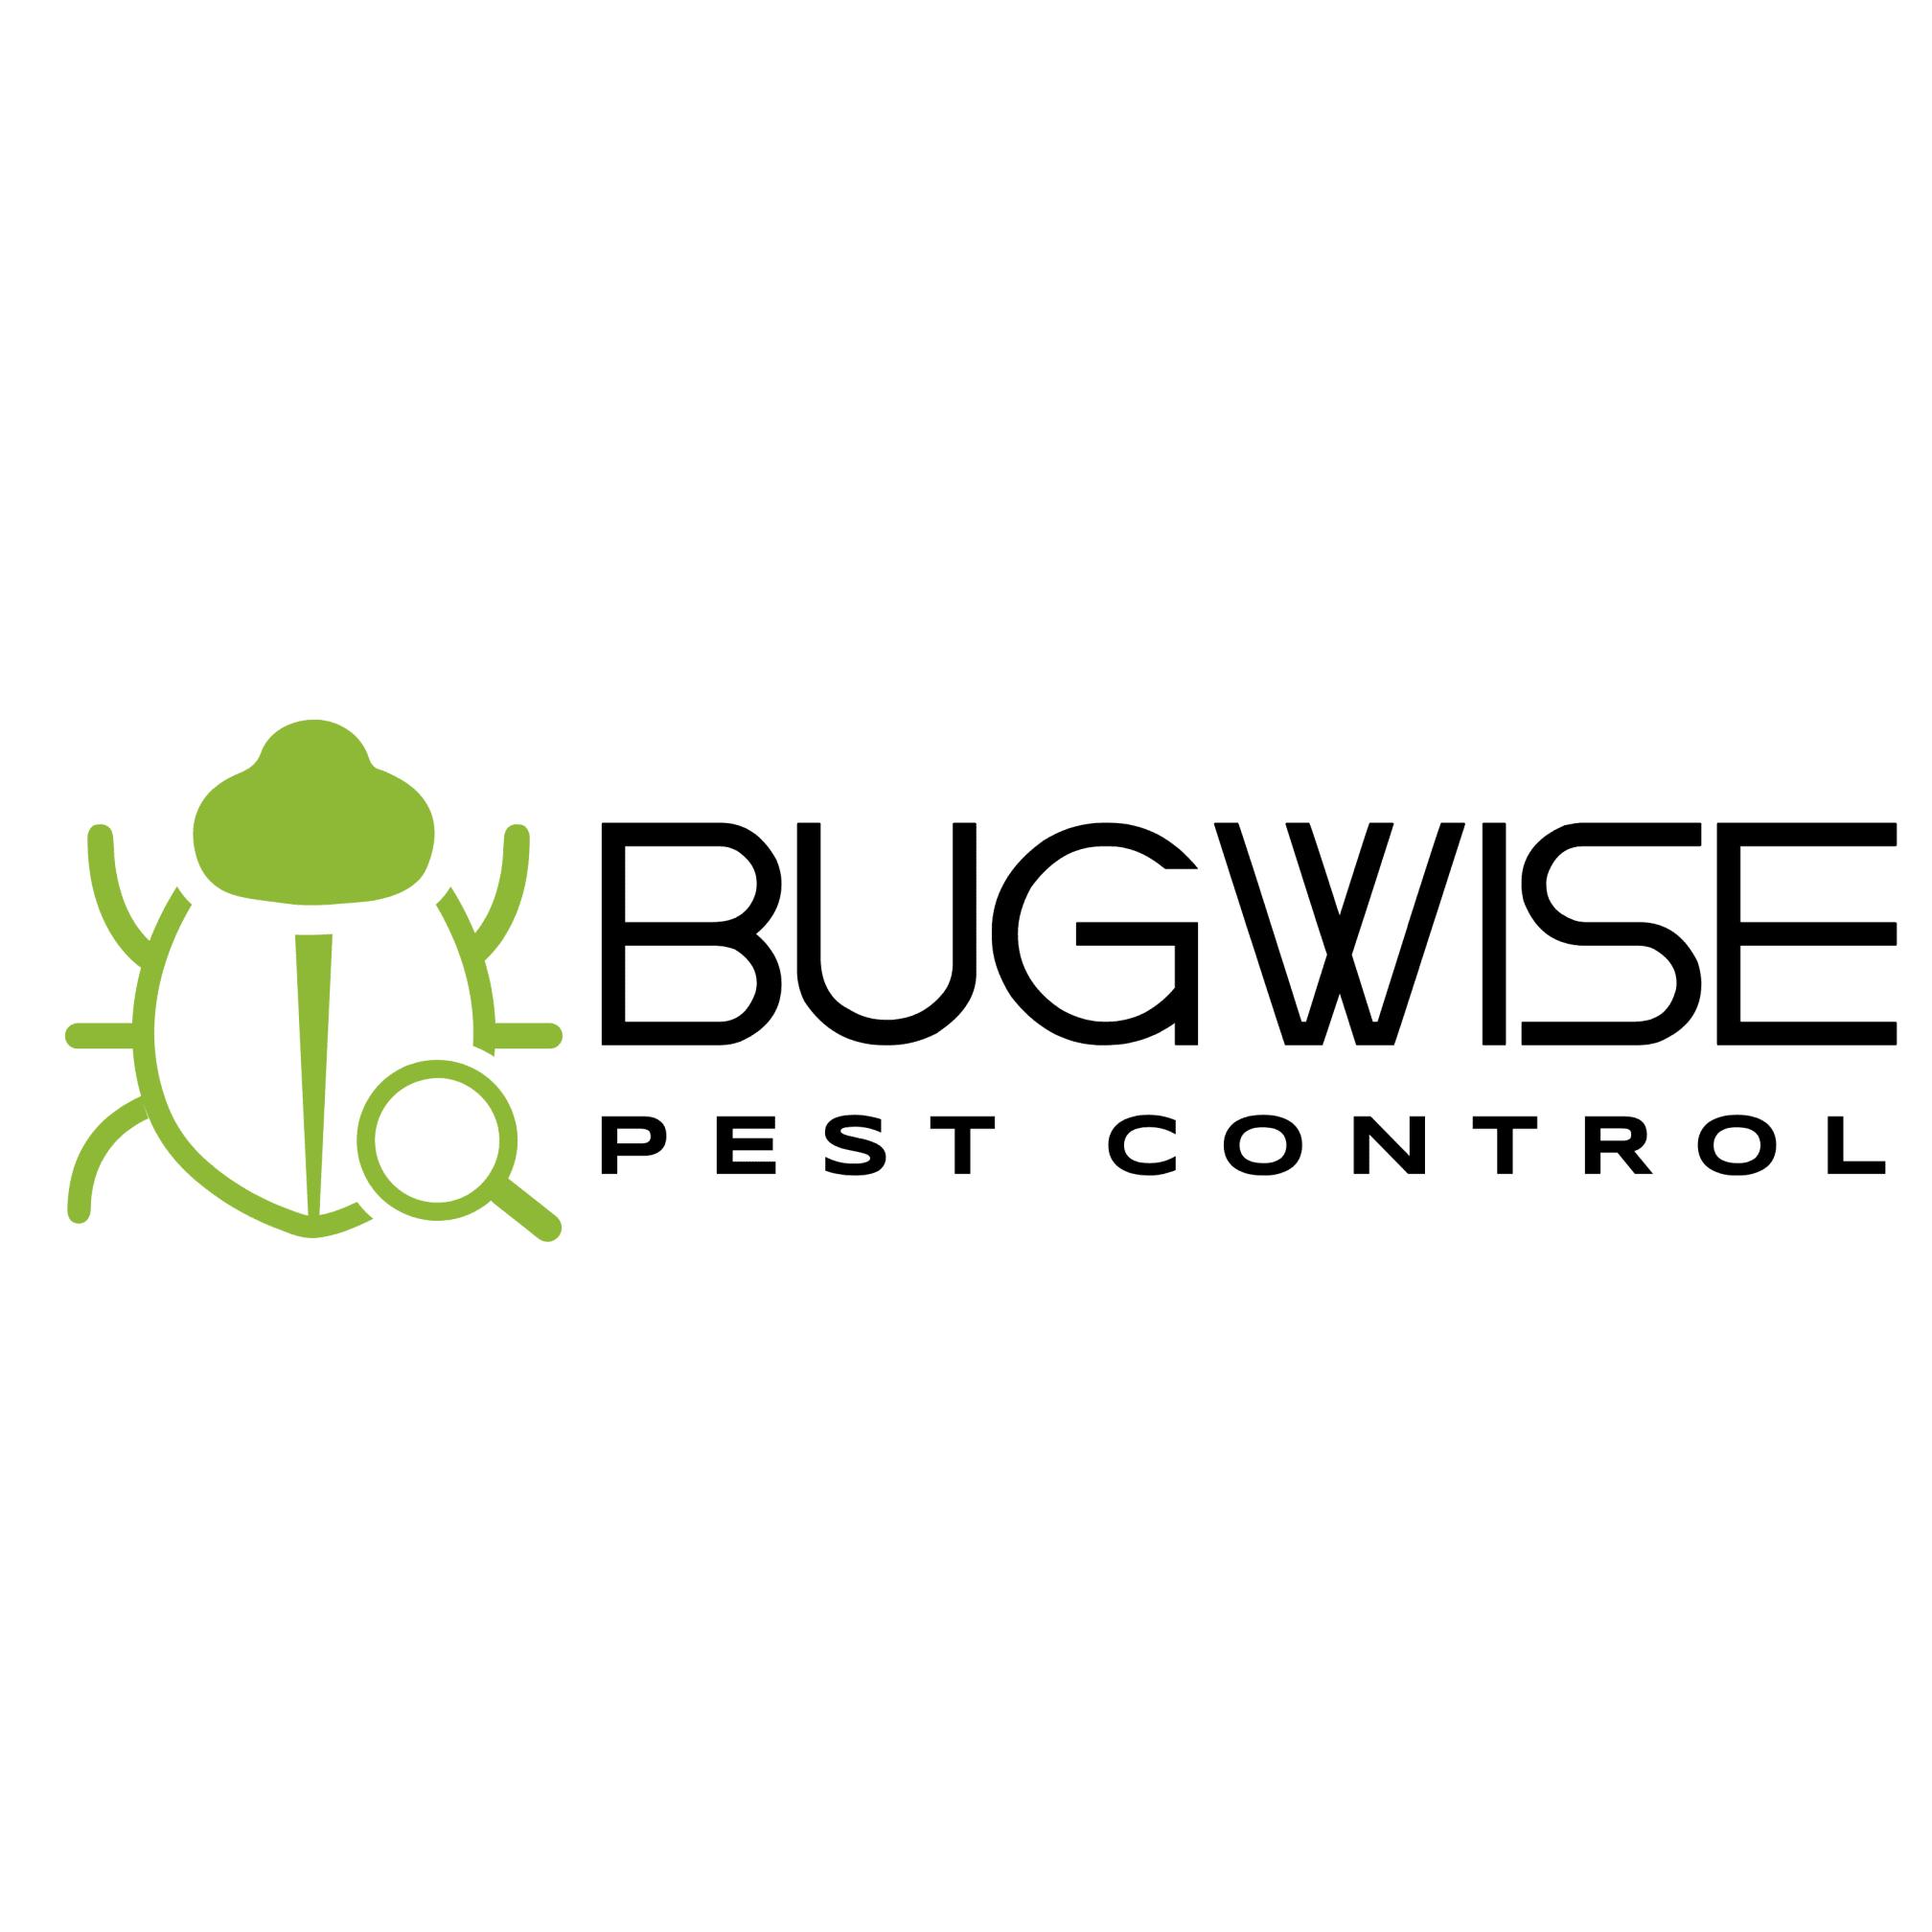 Bugwise Pest Control